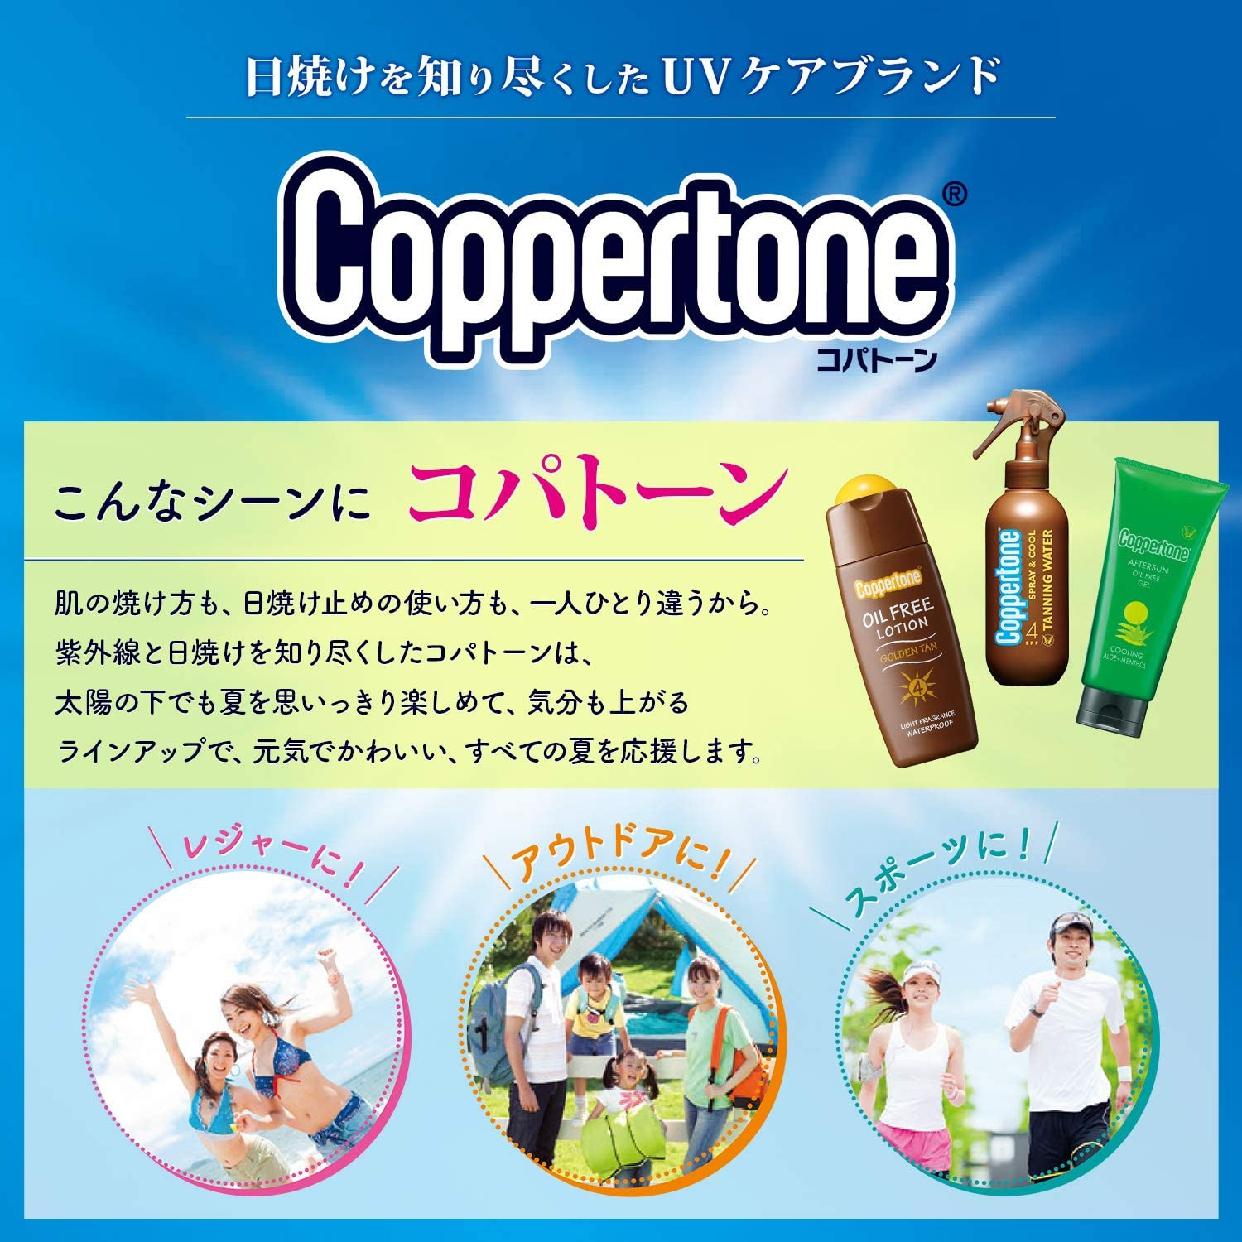 Coppertone(コパトーン) ゴールデン タン オイルフリー ローションの商品画像2